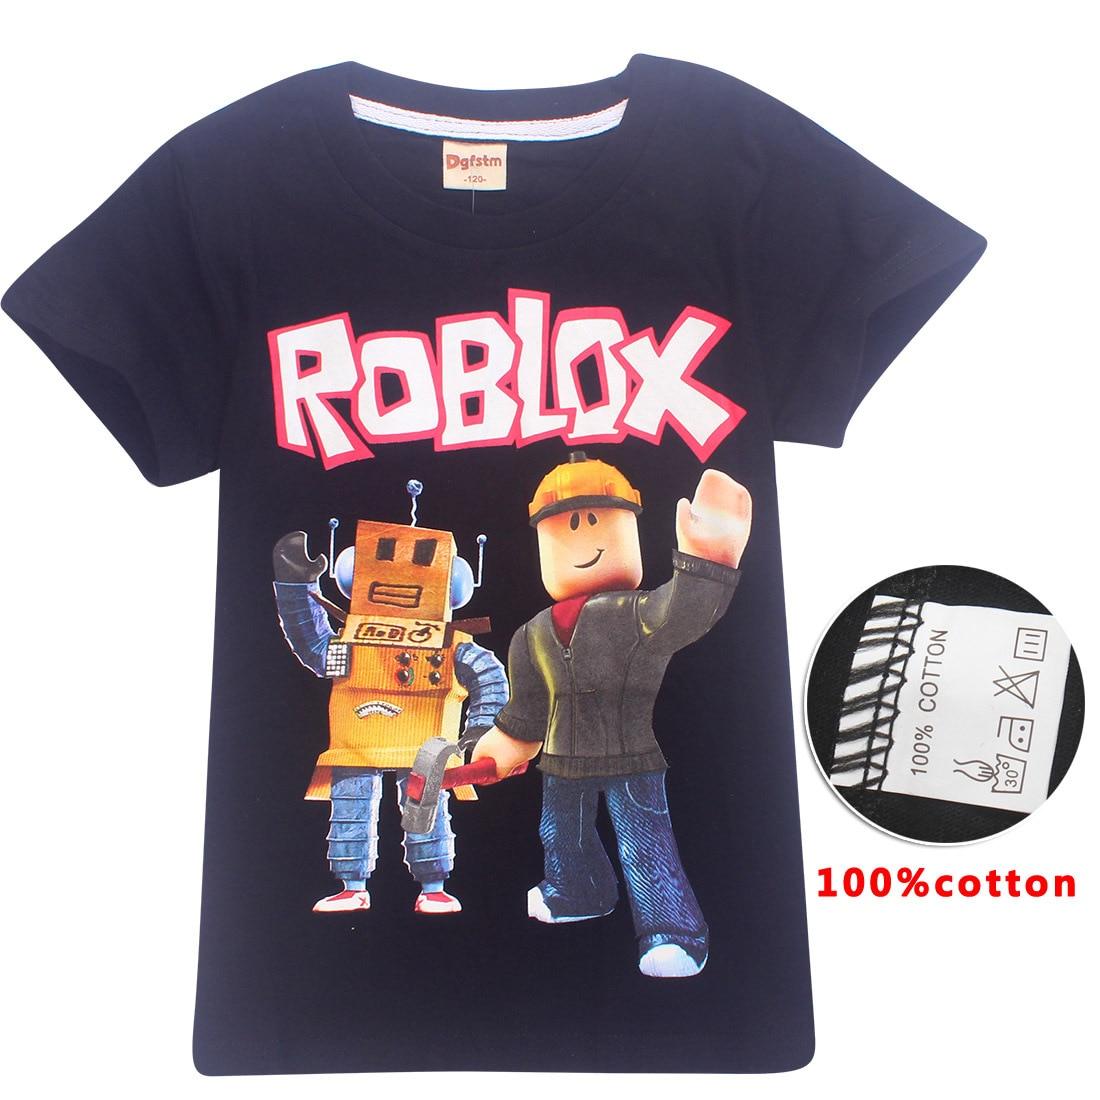 Dropwow Childrens Day Kids Boys T Shirt Girls Tops Tees Cartoon